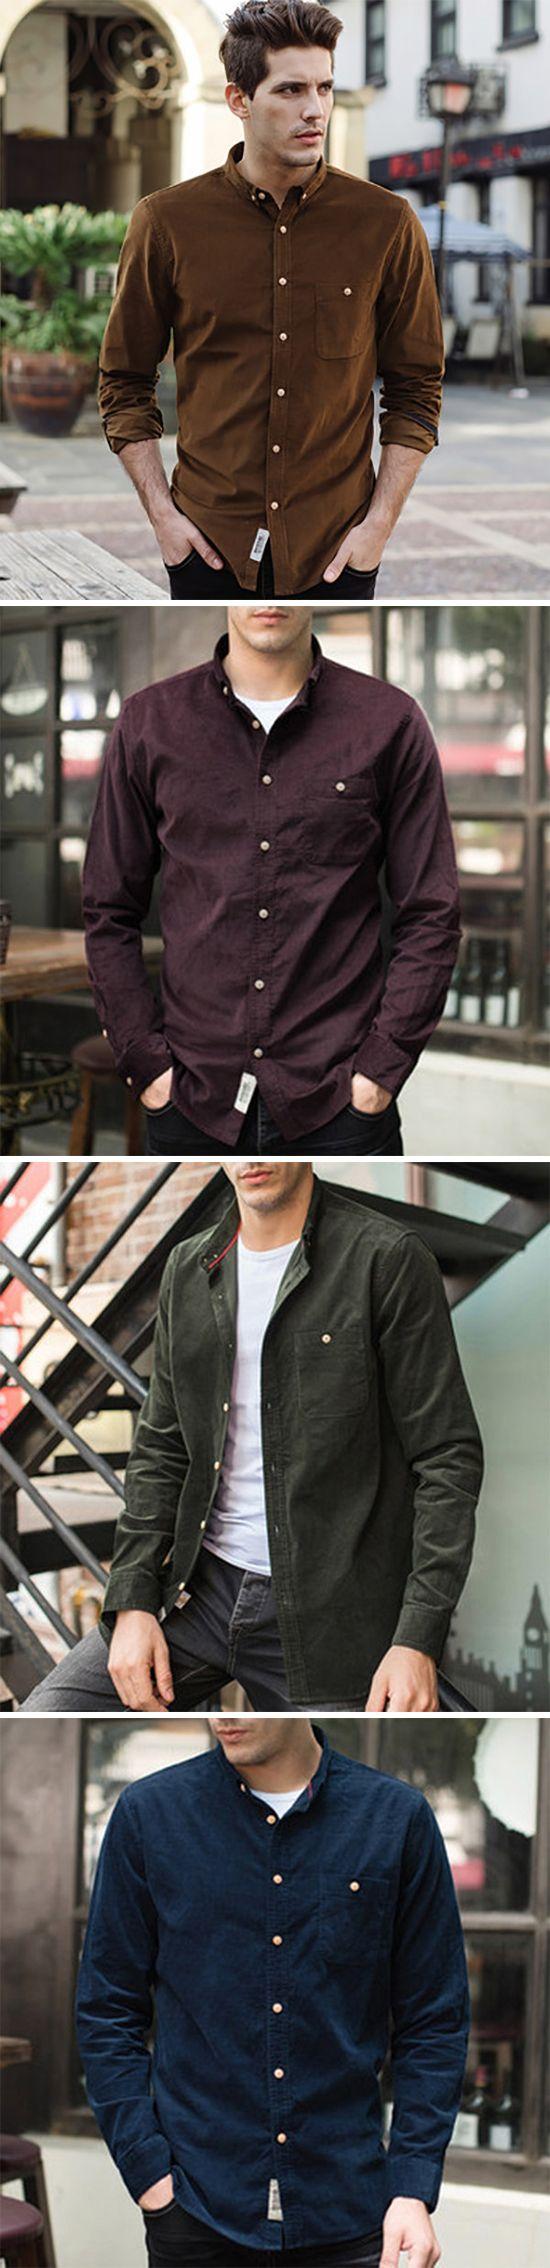 Fall Corduroy Casual Shirt for Men:  Long Sleeve/ Button Up